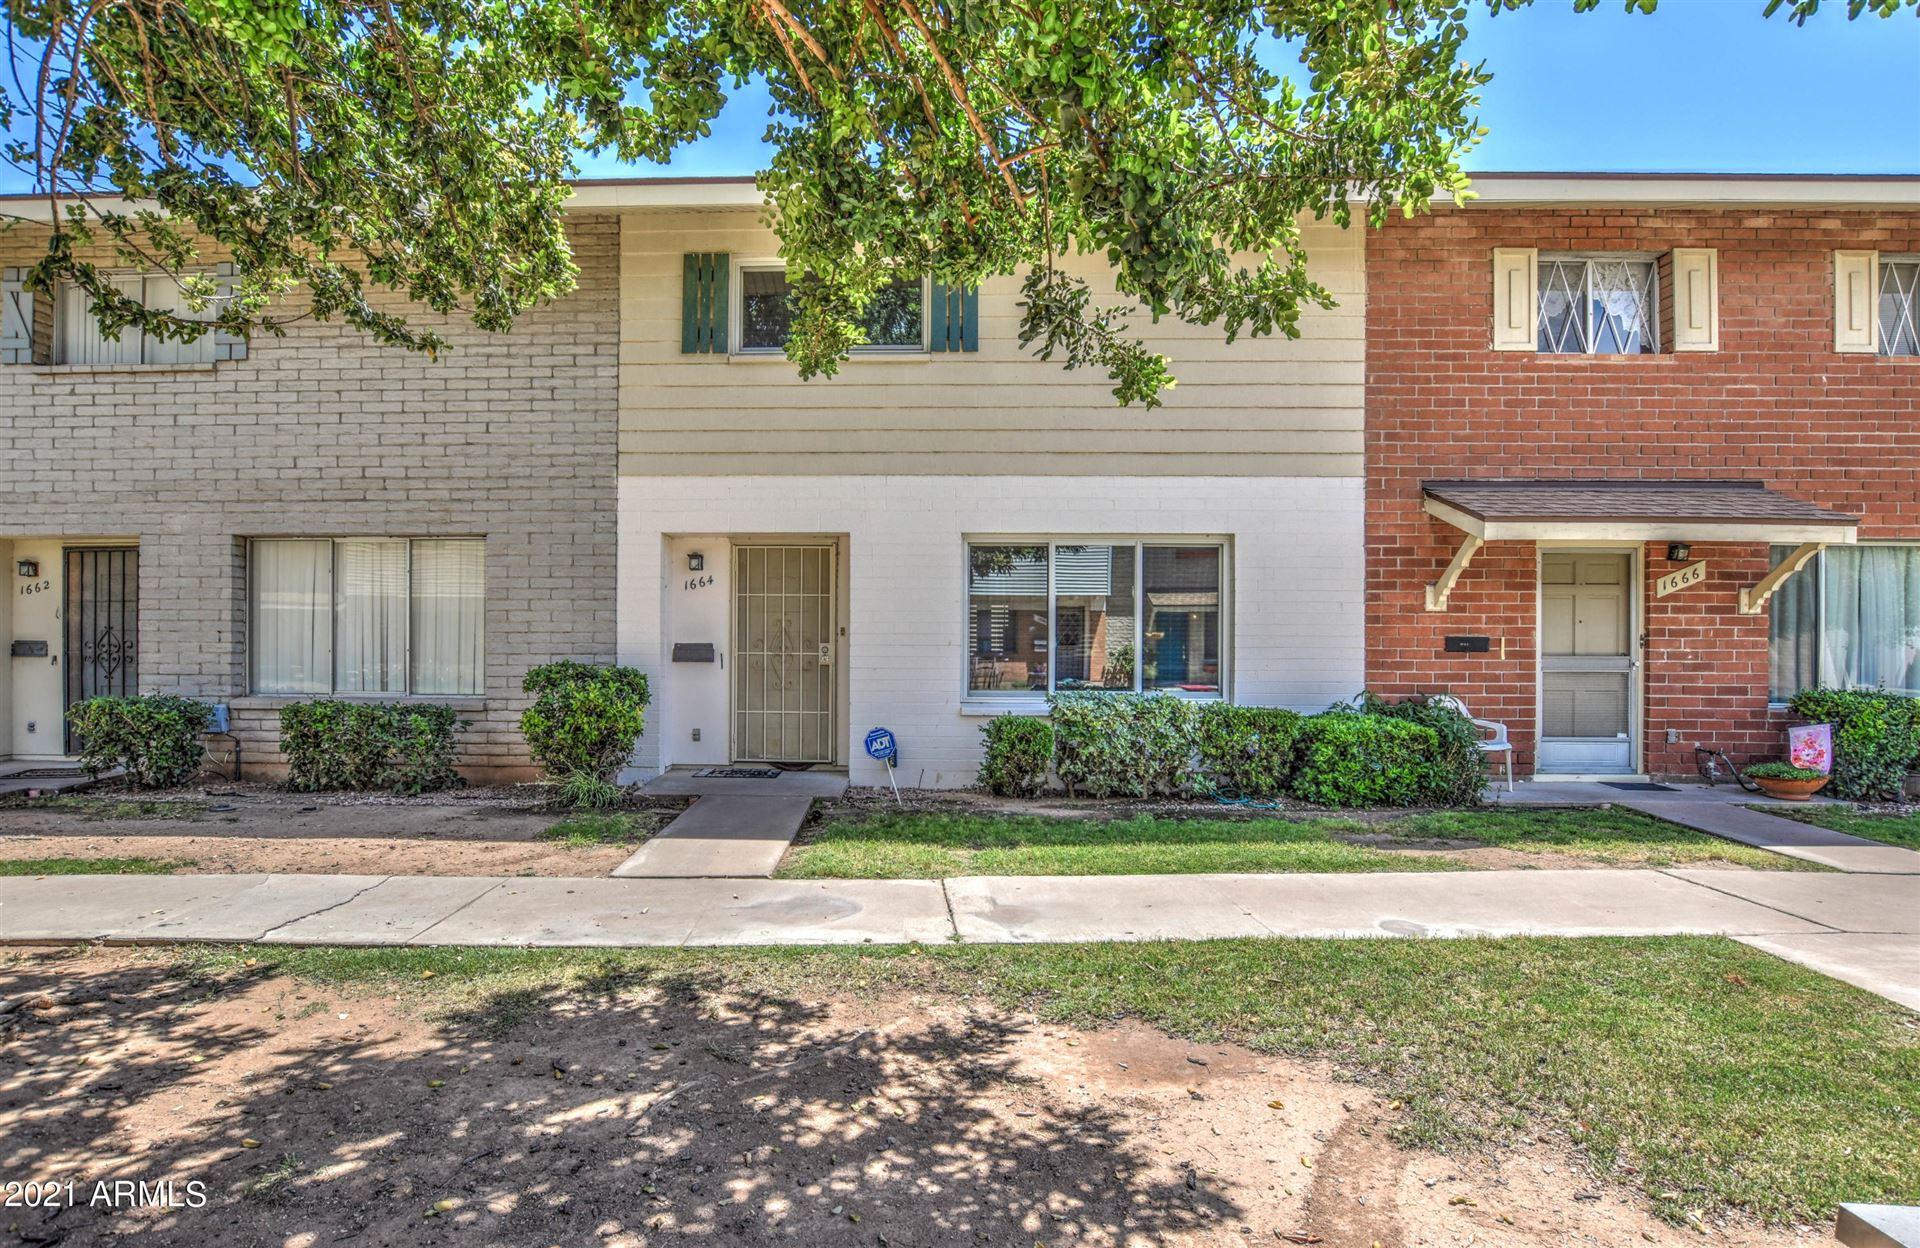 1664 W CAMPBELL Avenue W, Phoenix, AZ 85015 - MLS#: 6232370